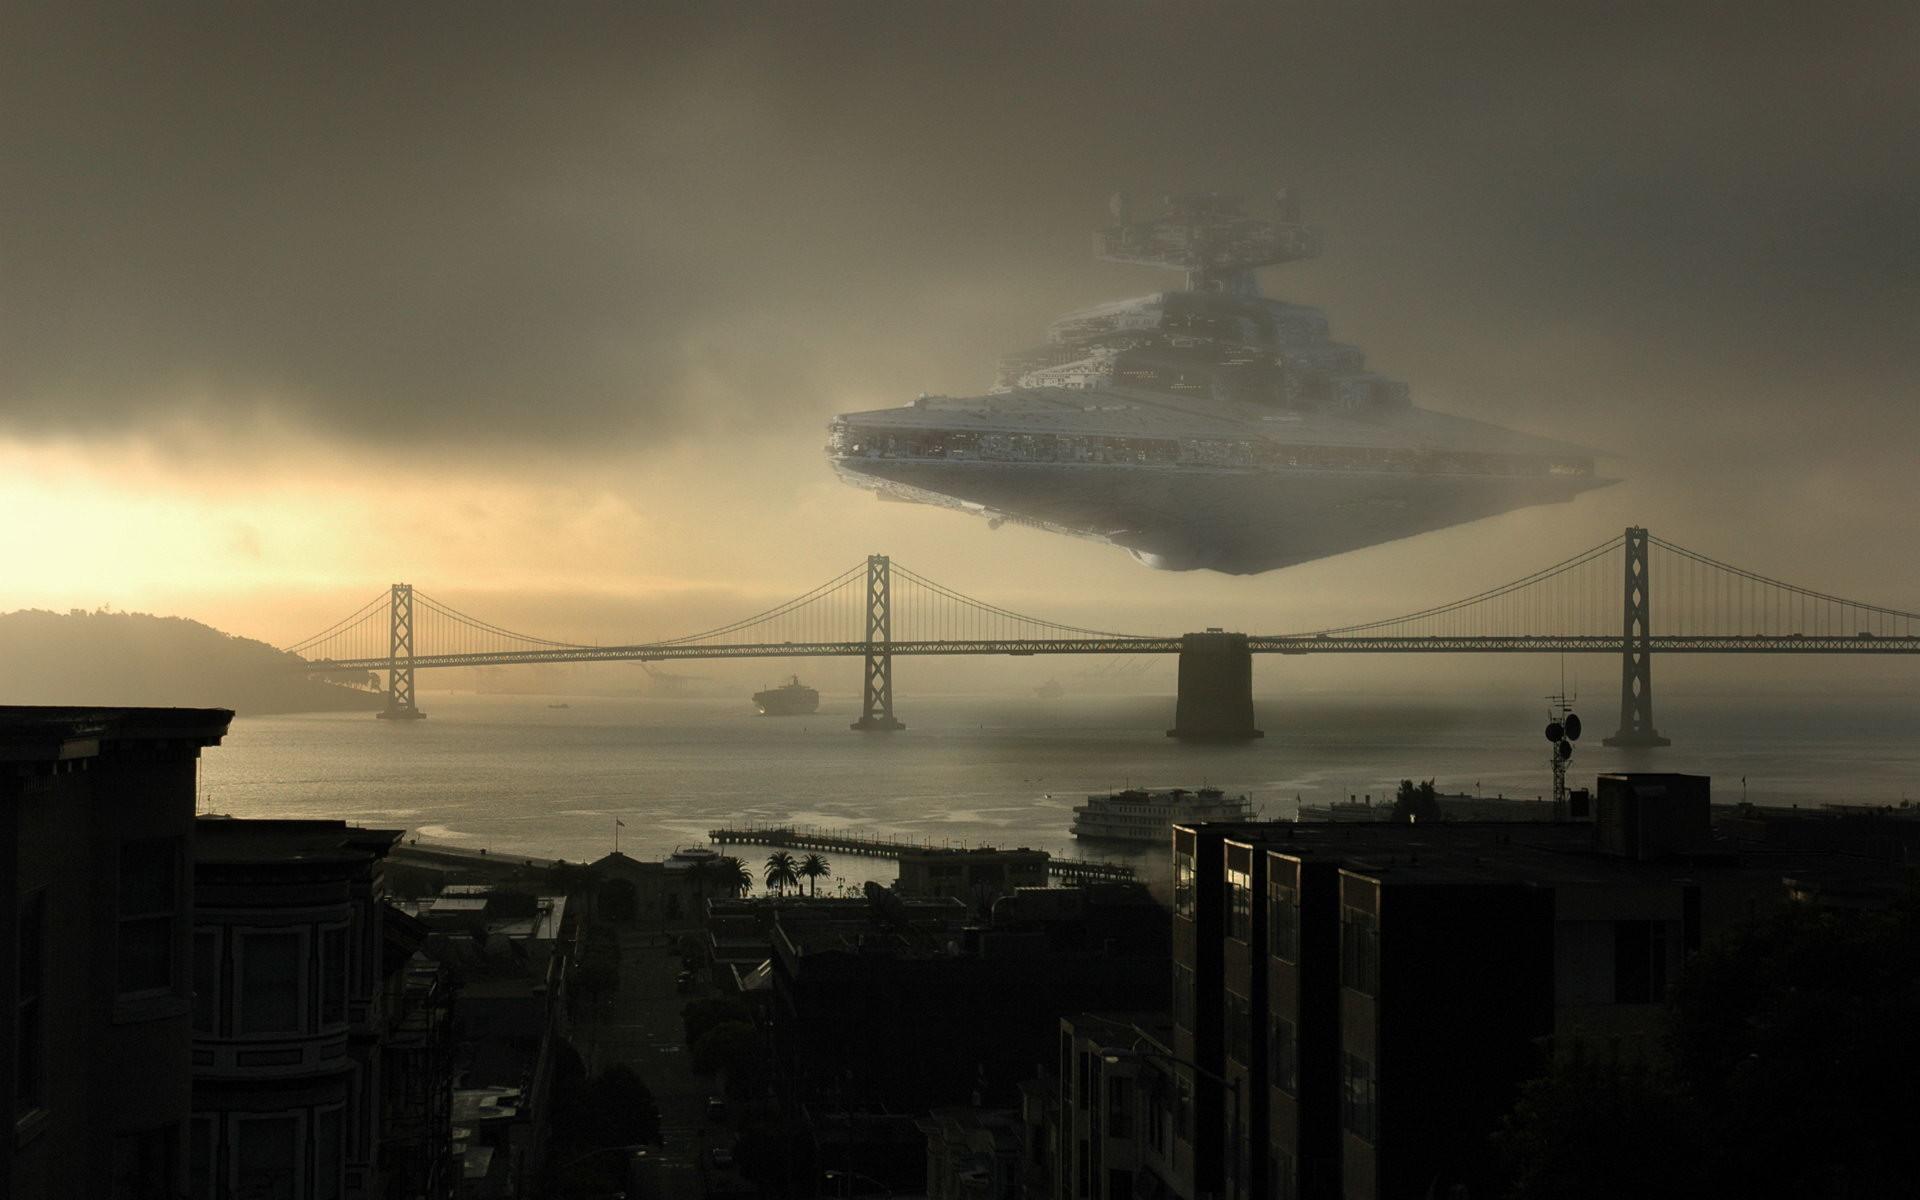 Movie Star Wars Star Destroyer Ship Landing New York Wallpaper